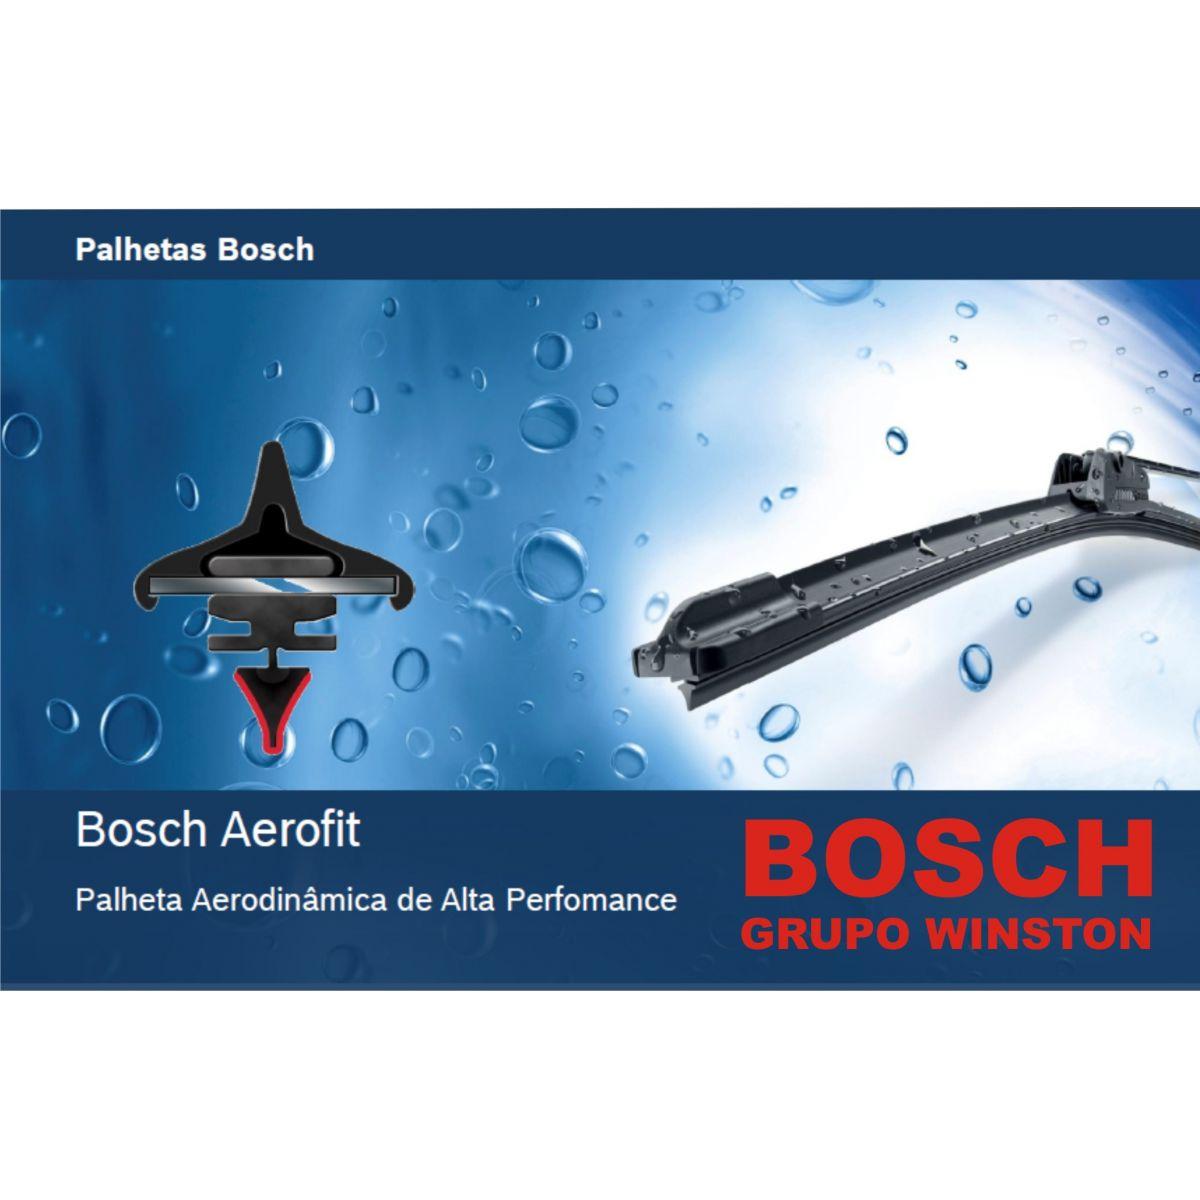 Palheta Bosch Aerofit Limpador de para brisa Bosch NISSAN Pathfinder